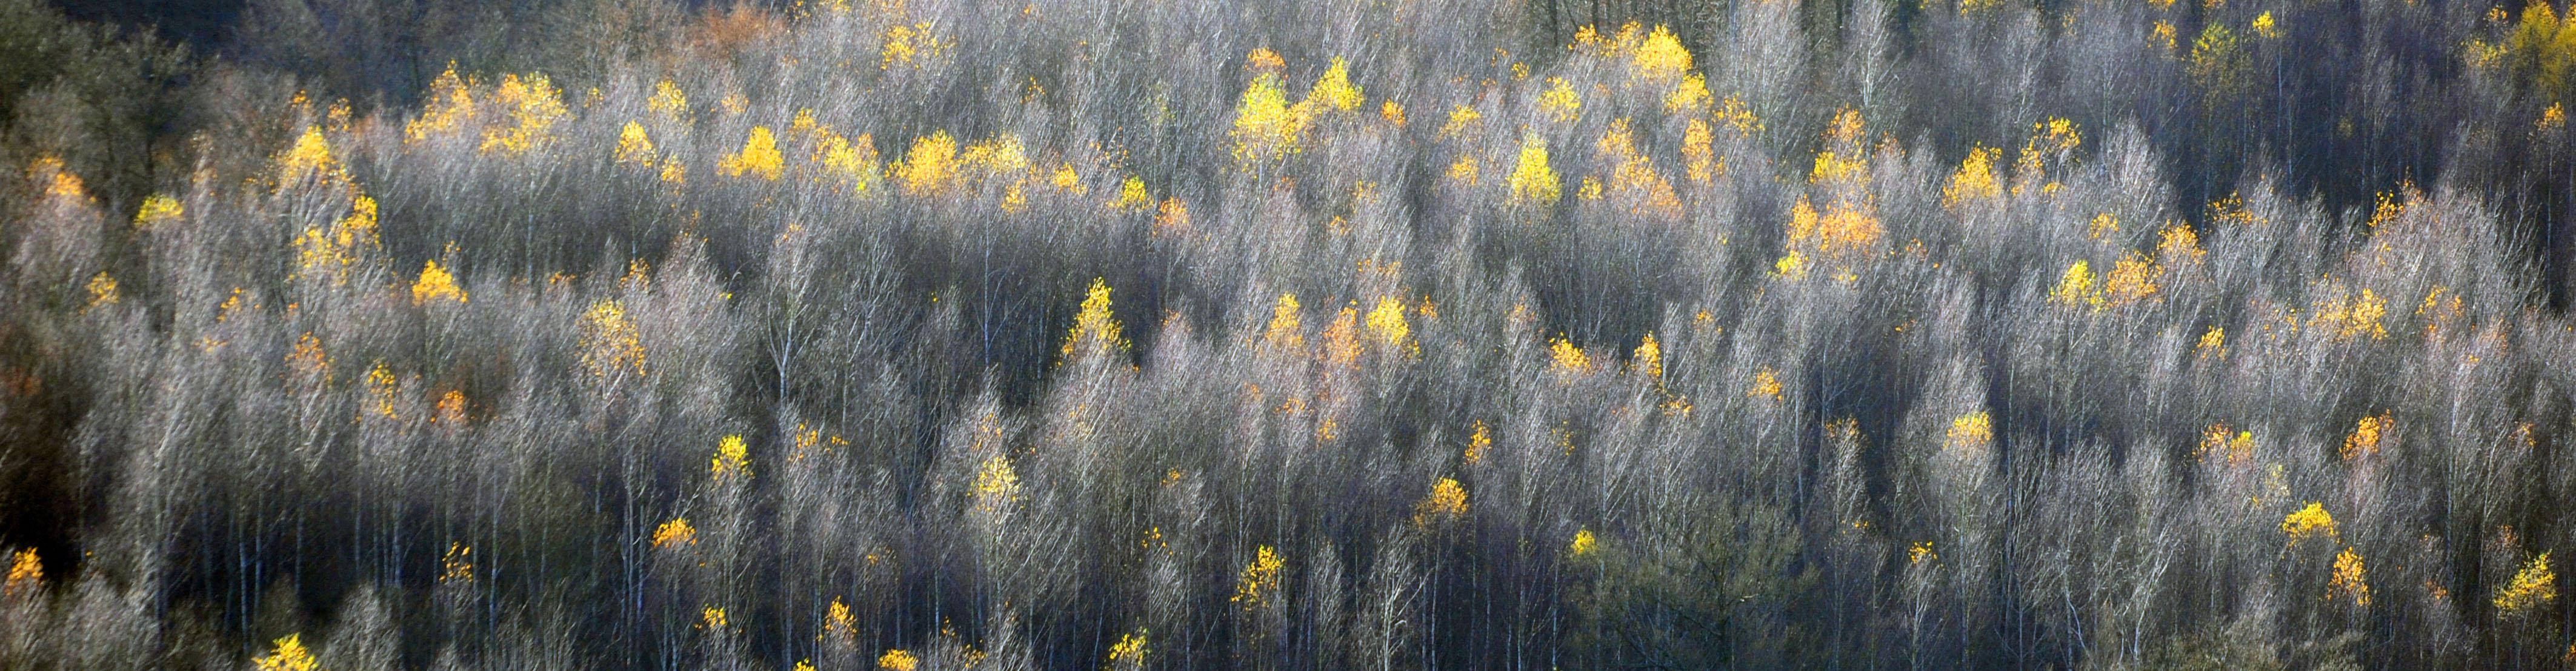 Birken im Herbst, DE ©Johannes Ratermann